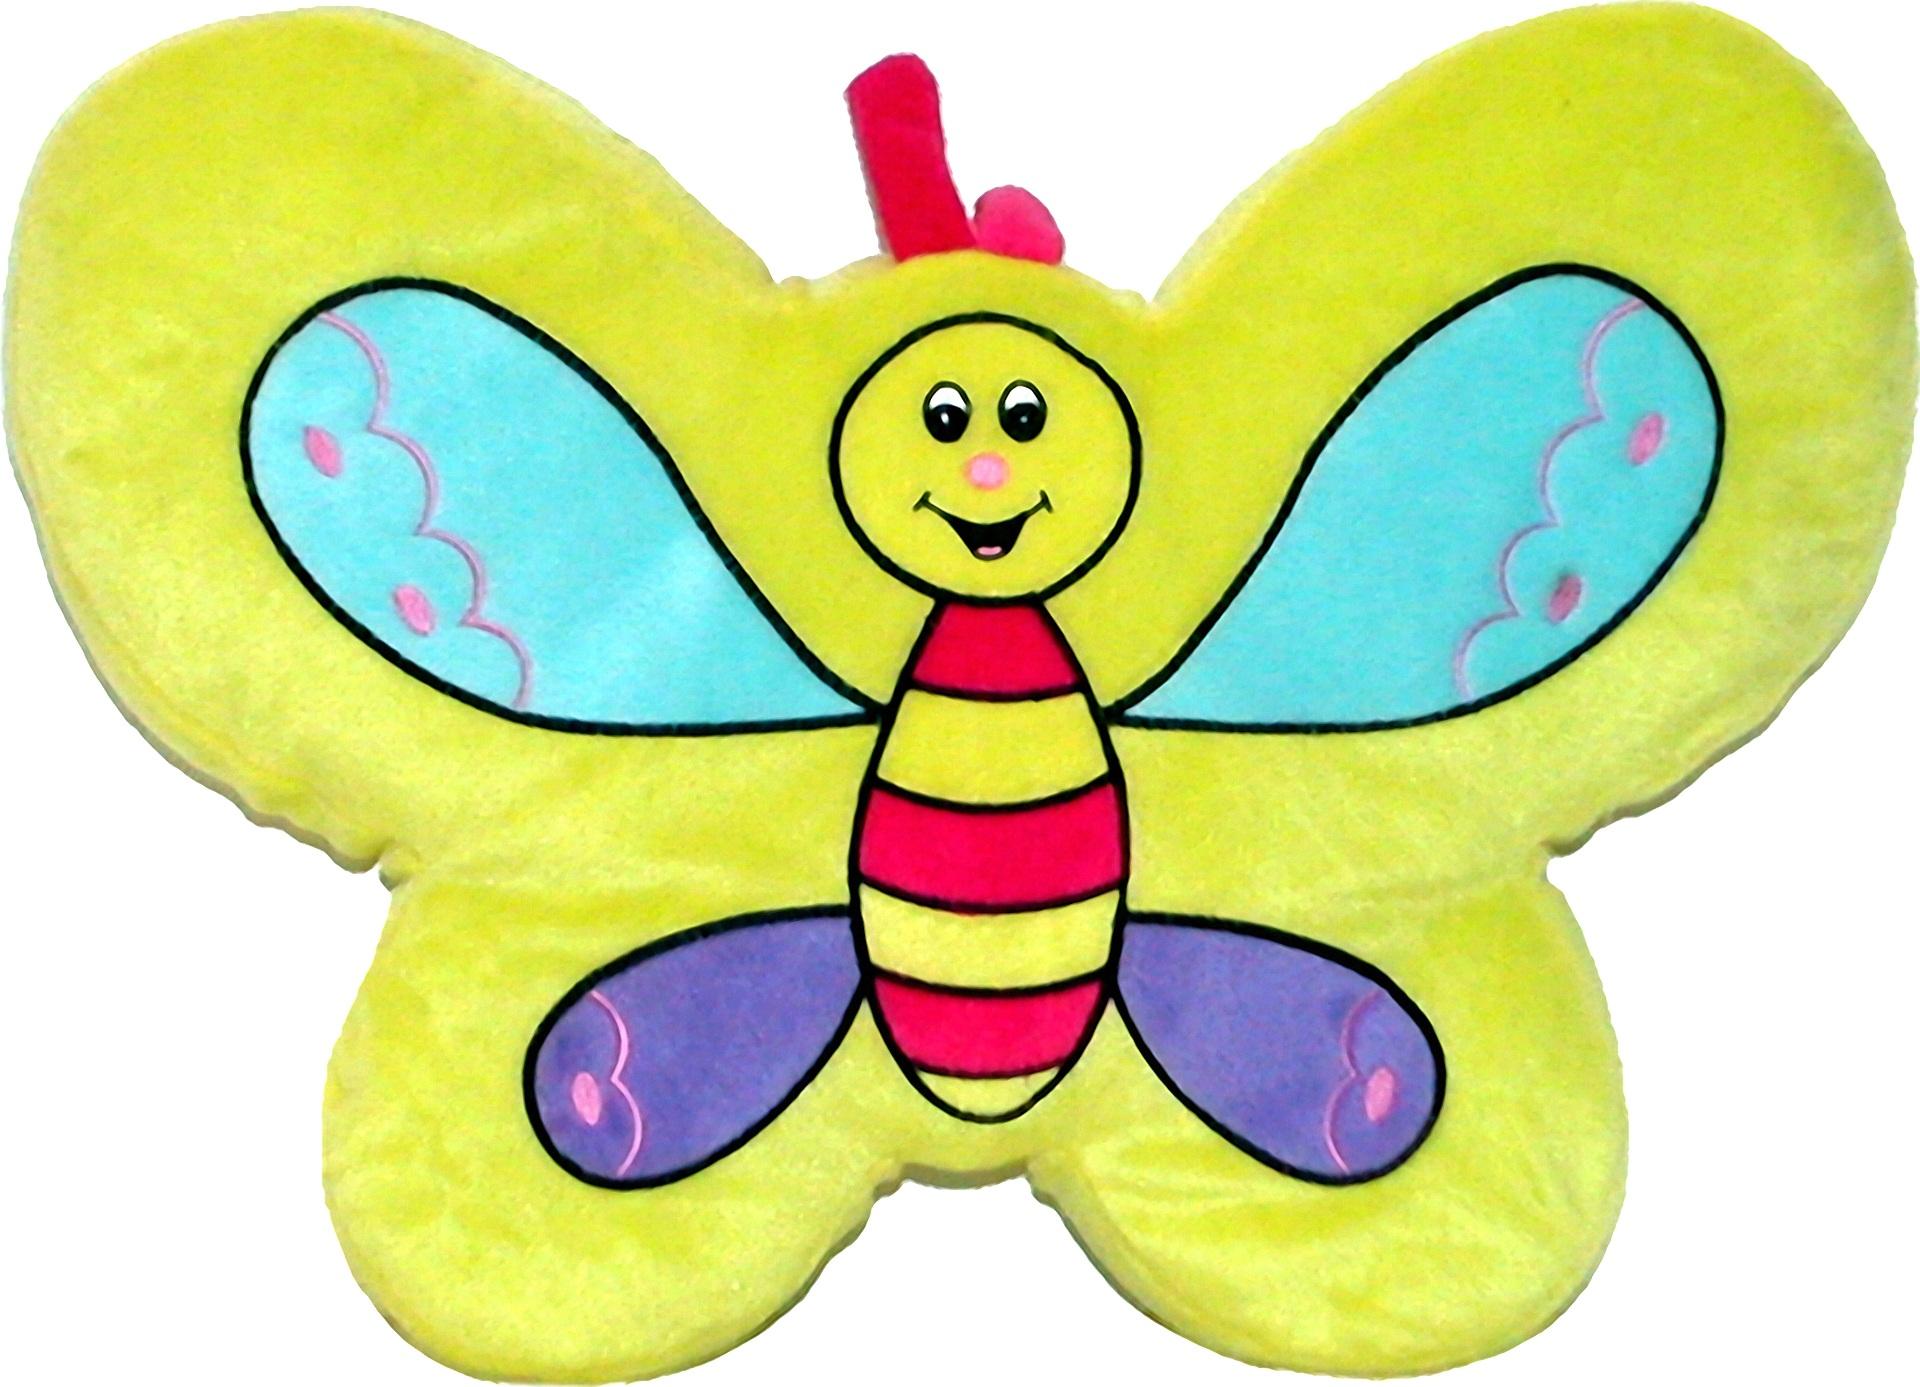 Gambar Serangga Anak Bantal Invertebrata Produk Gambar Kartun